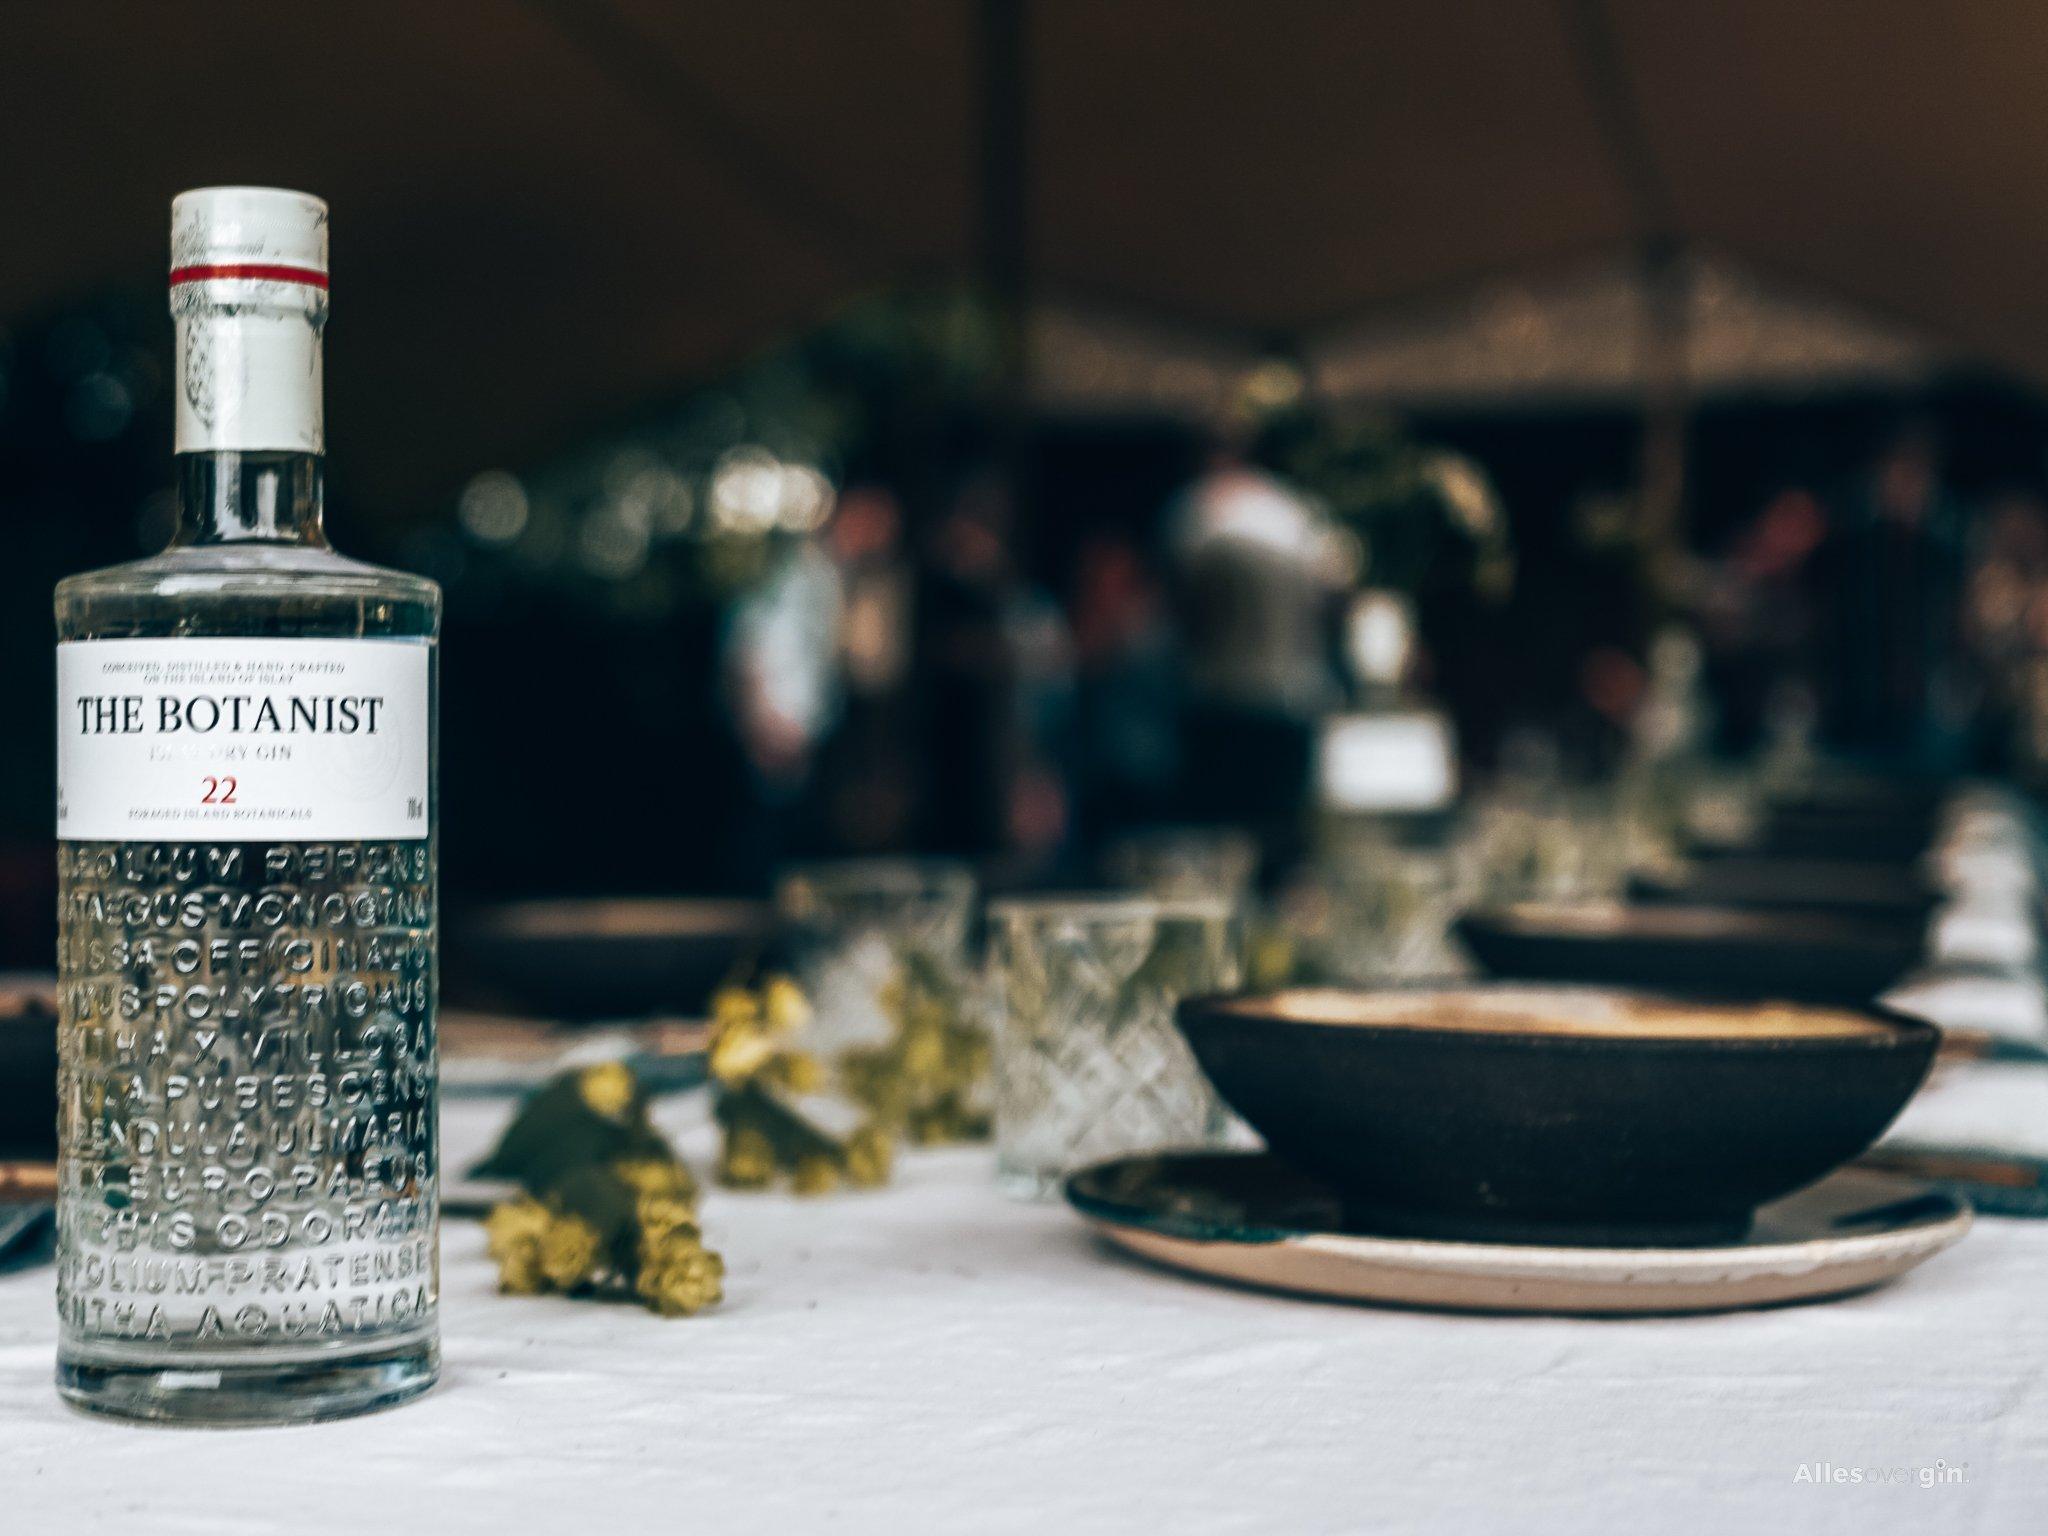 Foerageren met The Botanist Gin, Alles over gin.